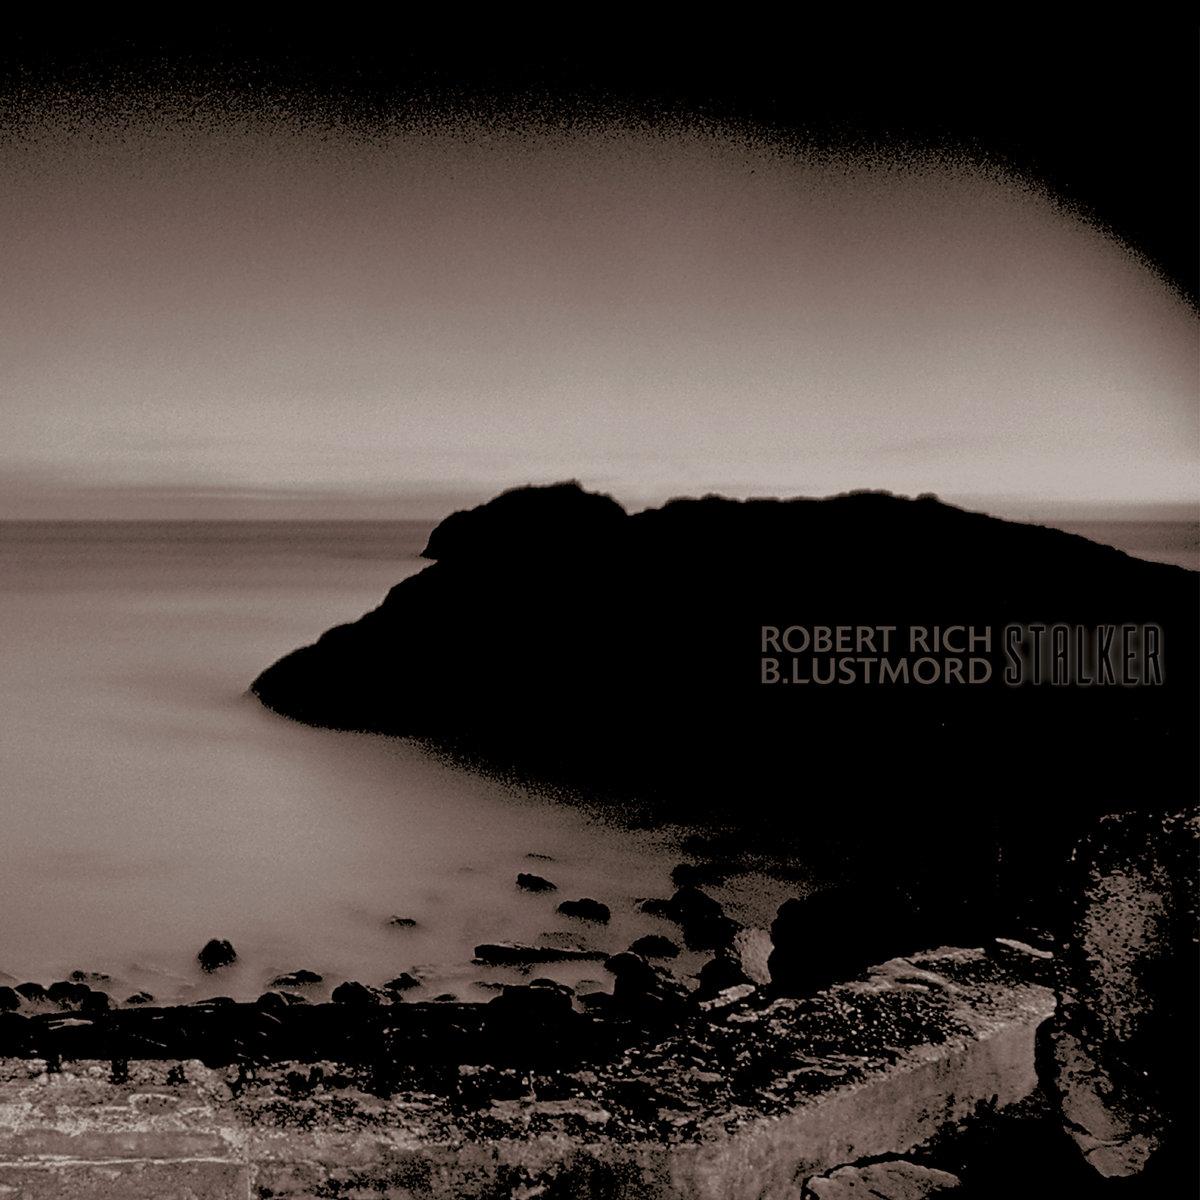 ROBERT RICH & B. LUSTMORD / STALKER [COLORED 2LP]